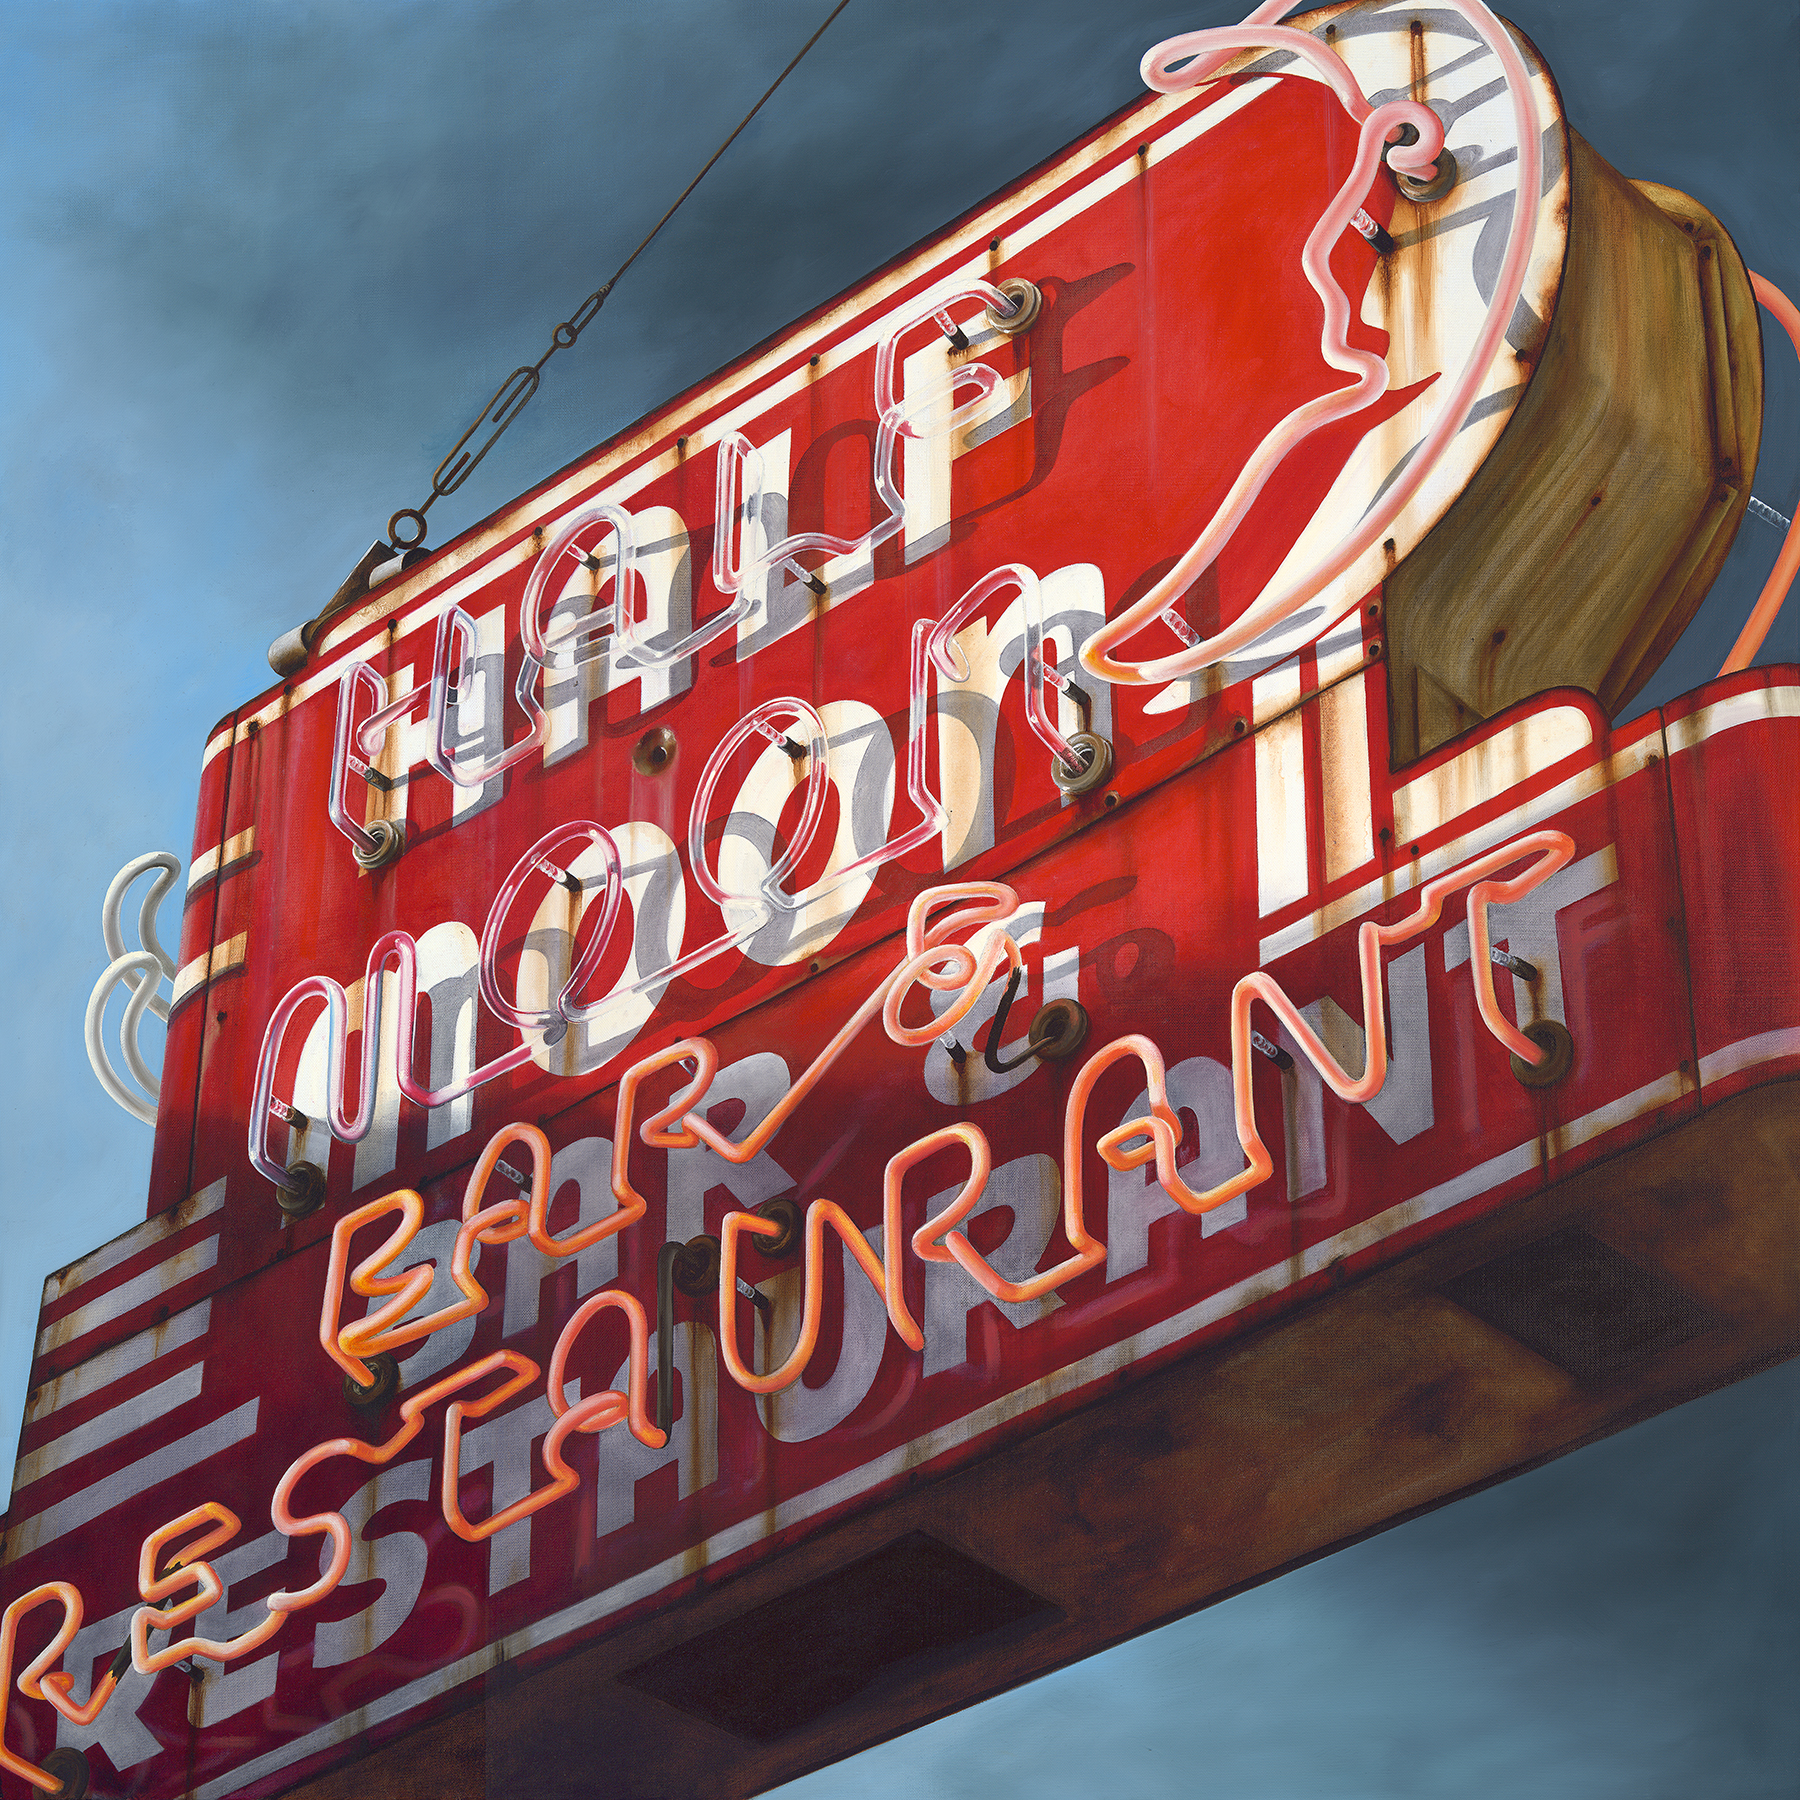 Half Moon Bar , 48x48in, Oil on Canvas, 2015